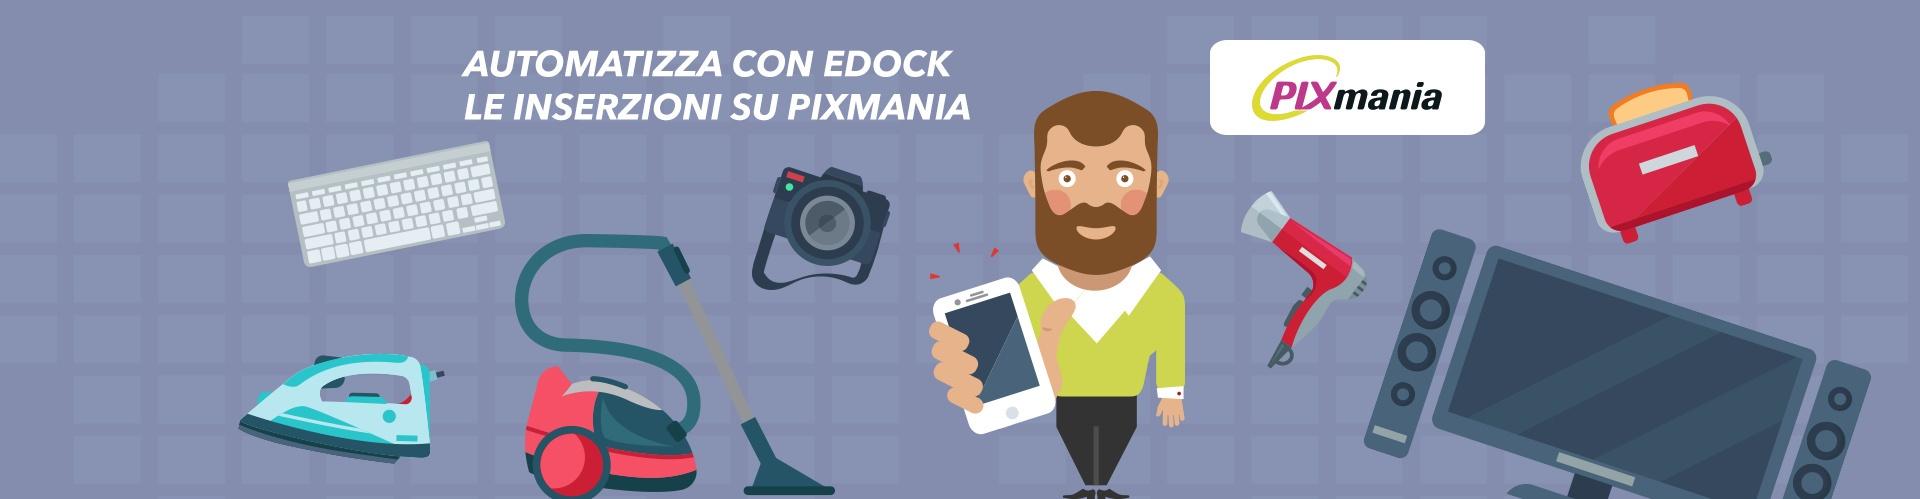 pixmania_banner.jpg